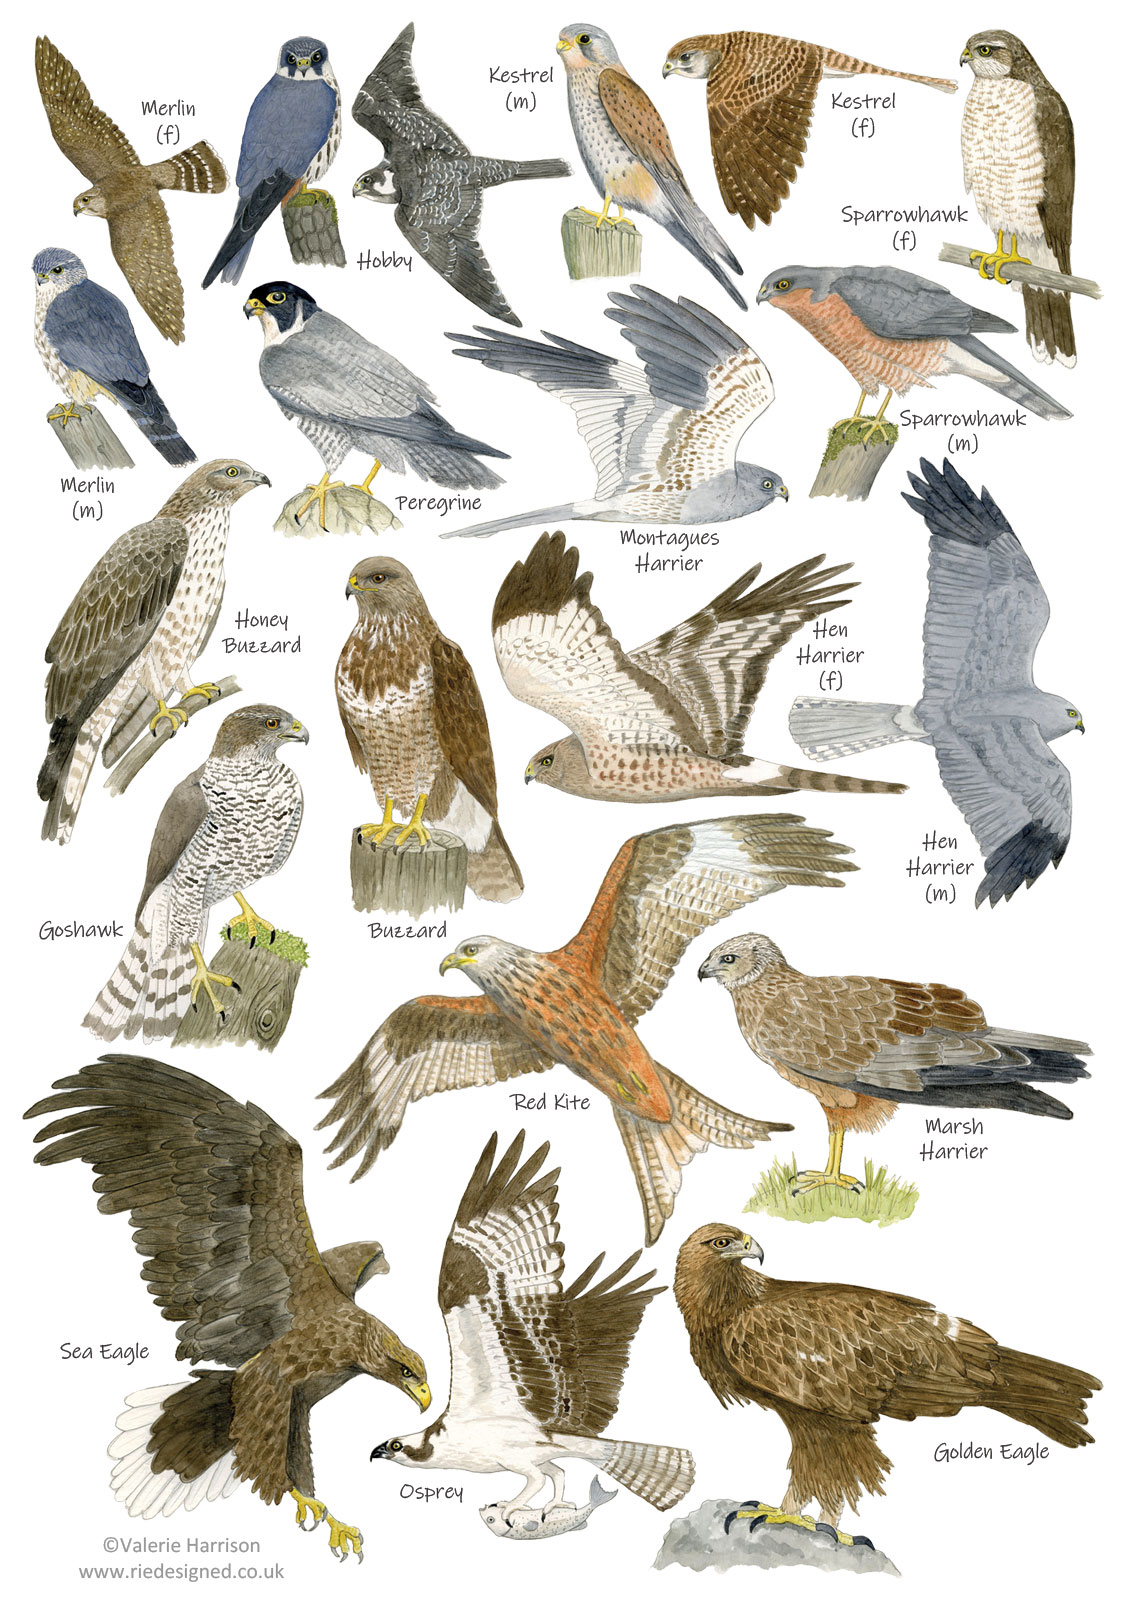 British Birds Of Prey Identification A5 Card Postcard Art Print